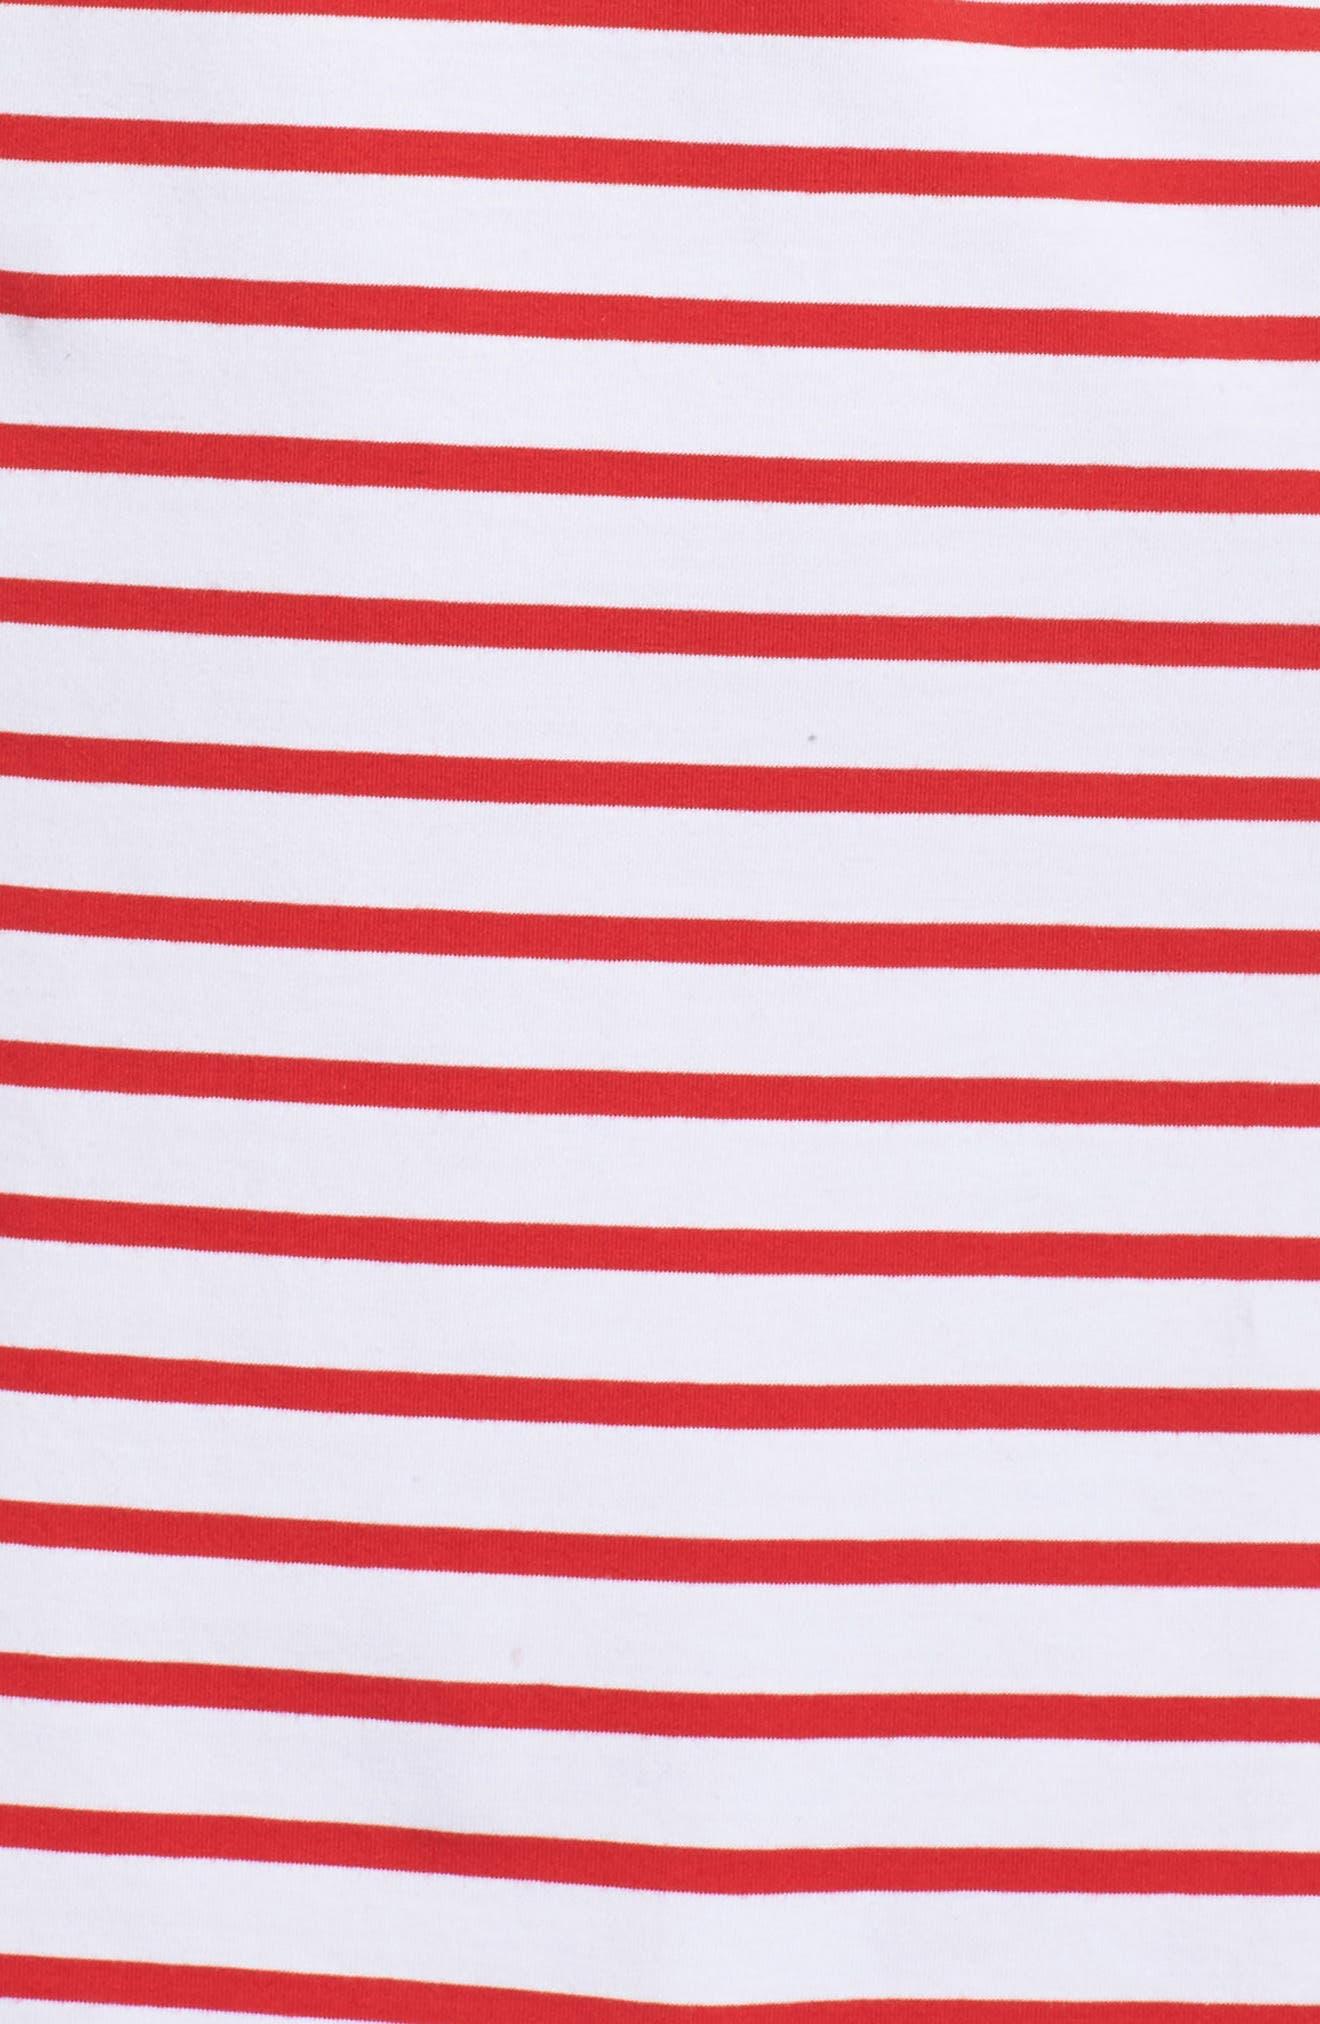 Stripe Shift Dress,                             Alternate thumbnail 8, color,                             Red Stripe